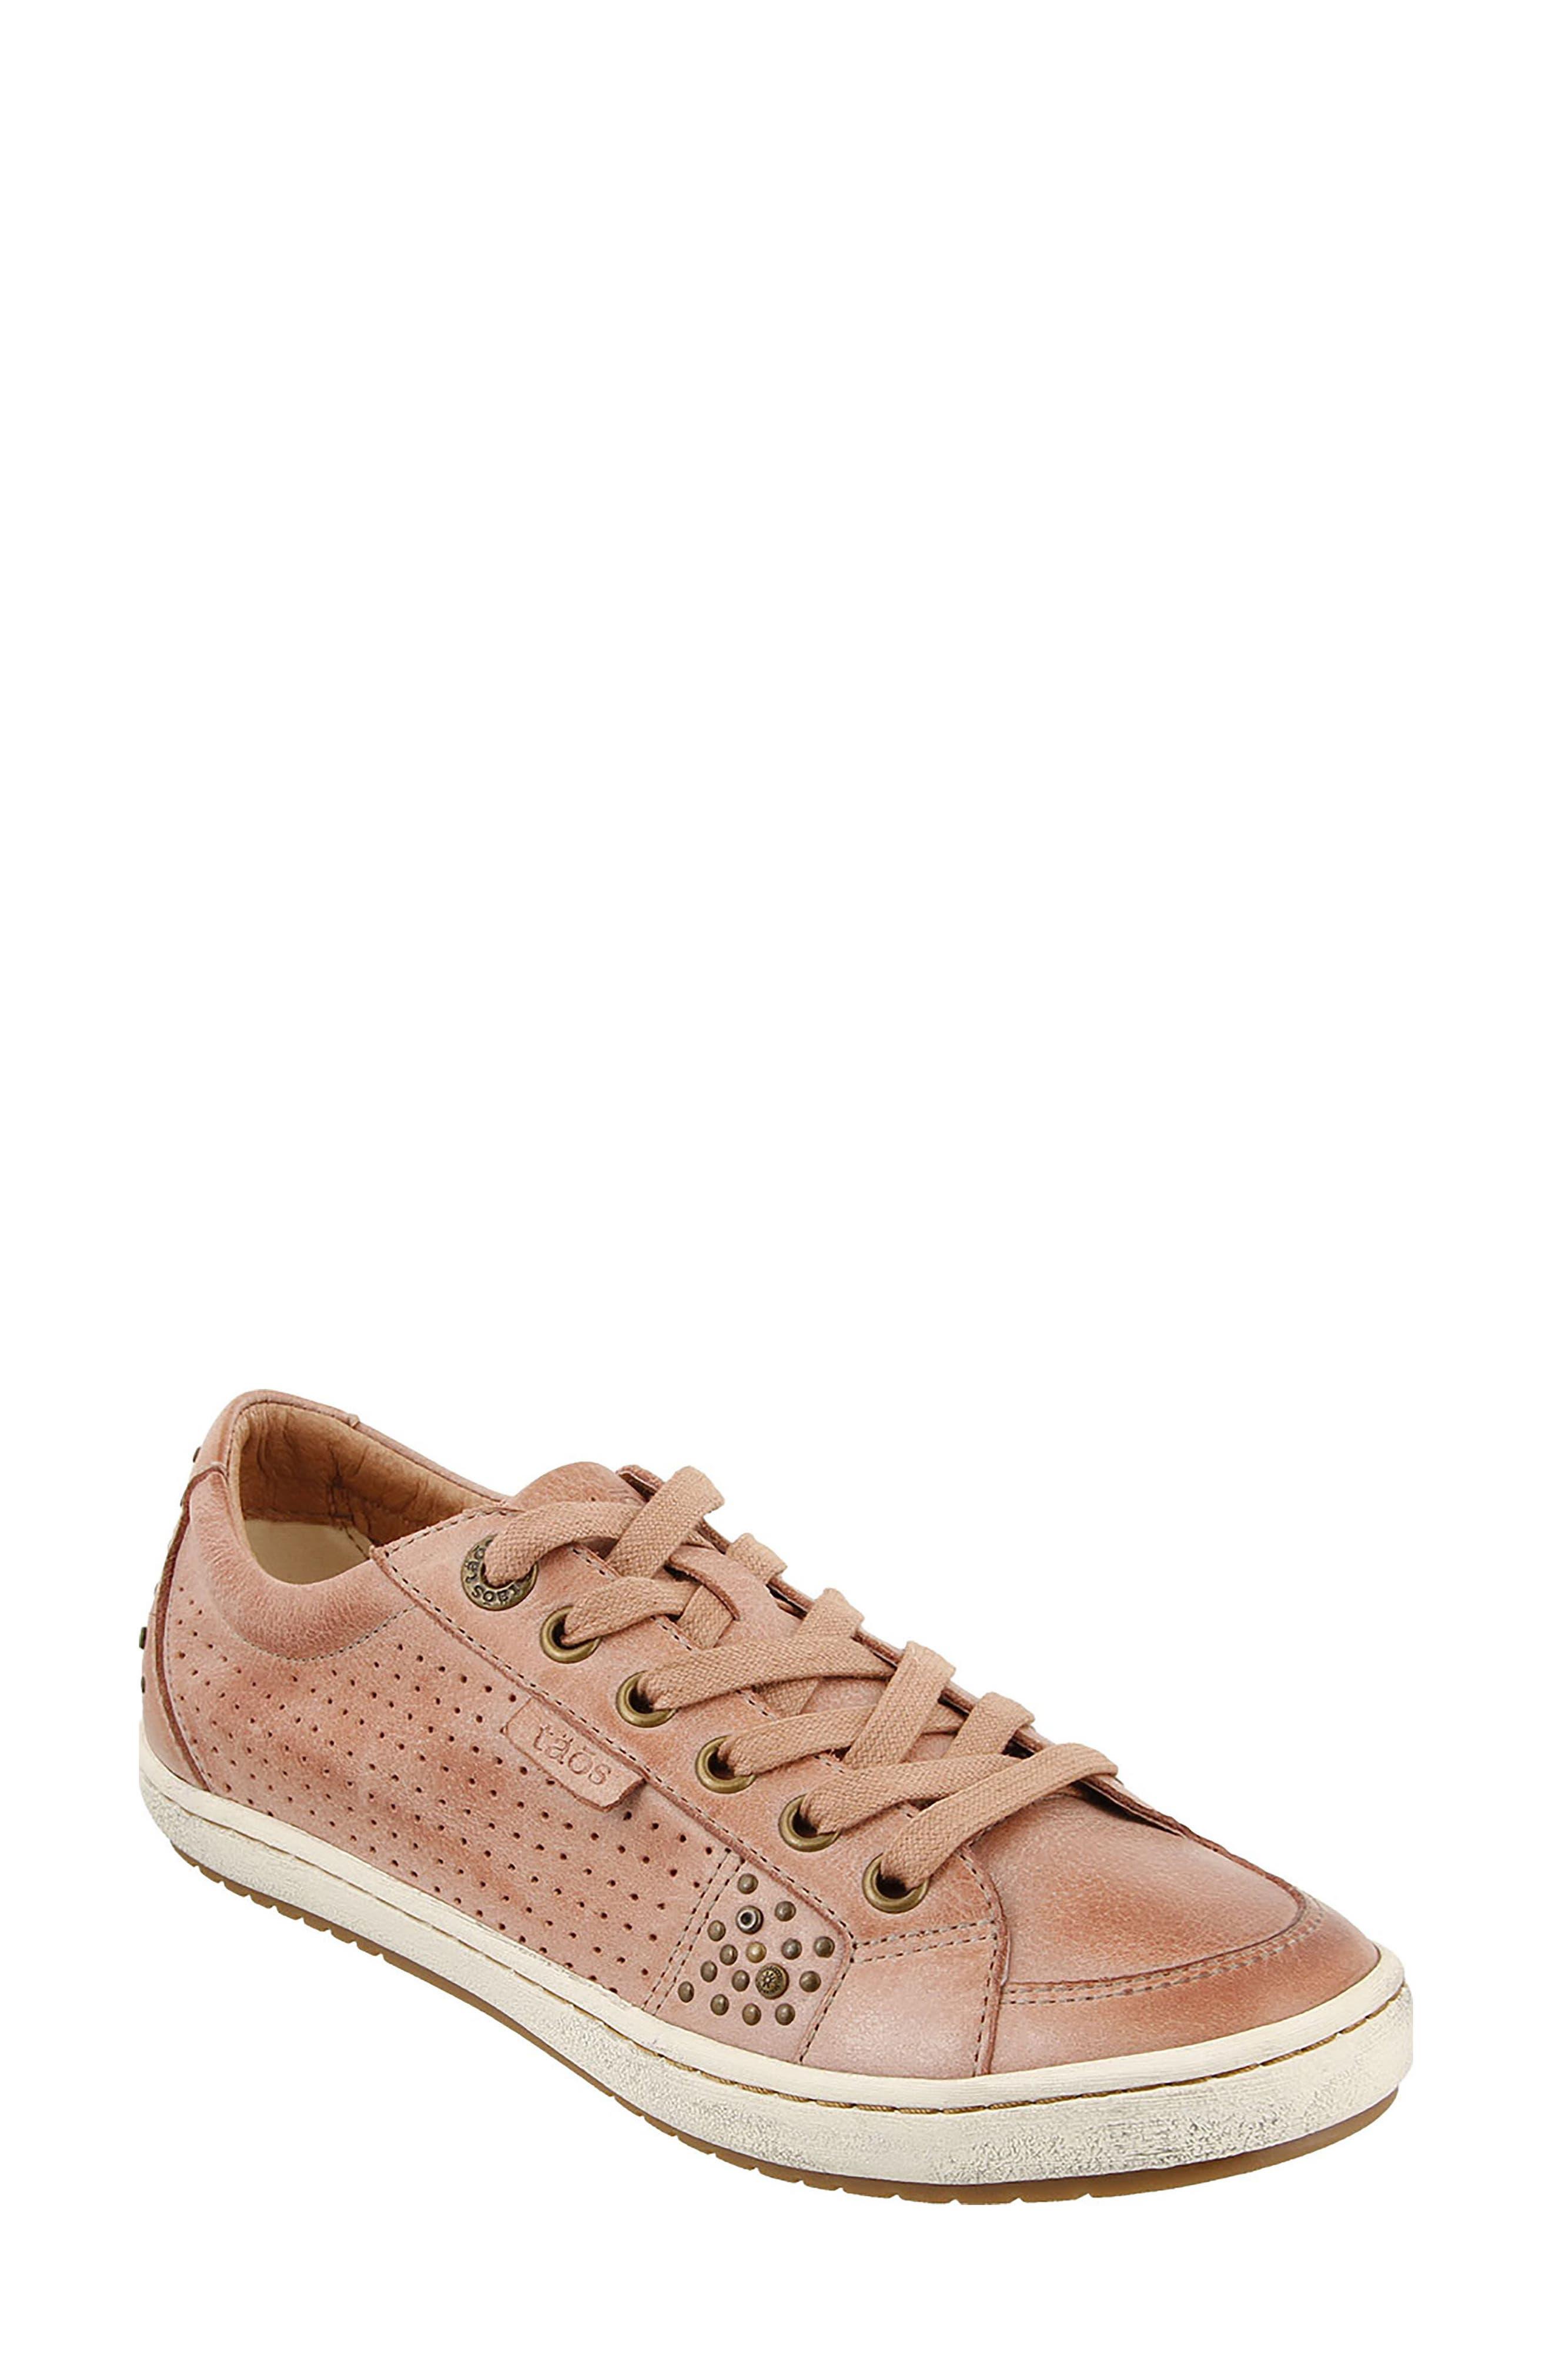 Alternate Image 1 Selected - Taos 'Freedom' Sneaker (Women)